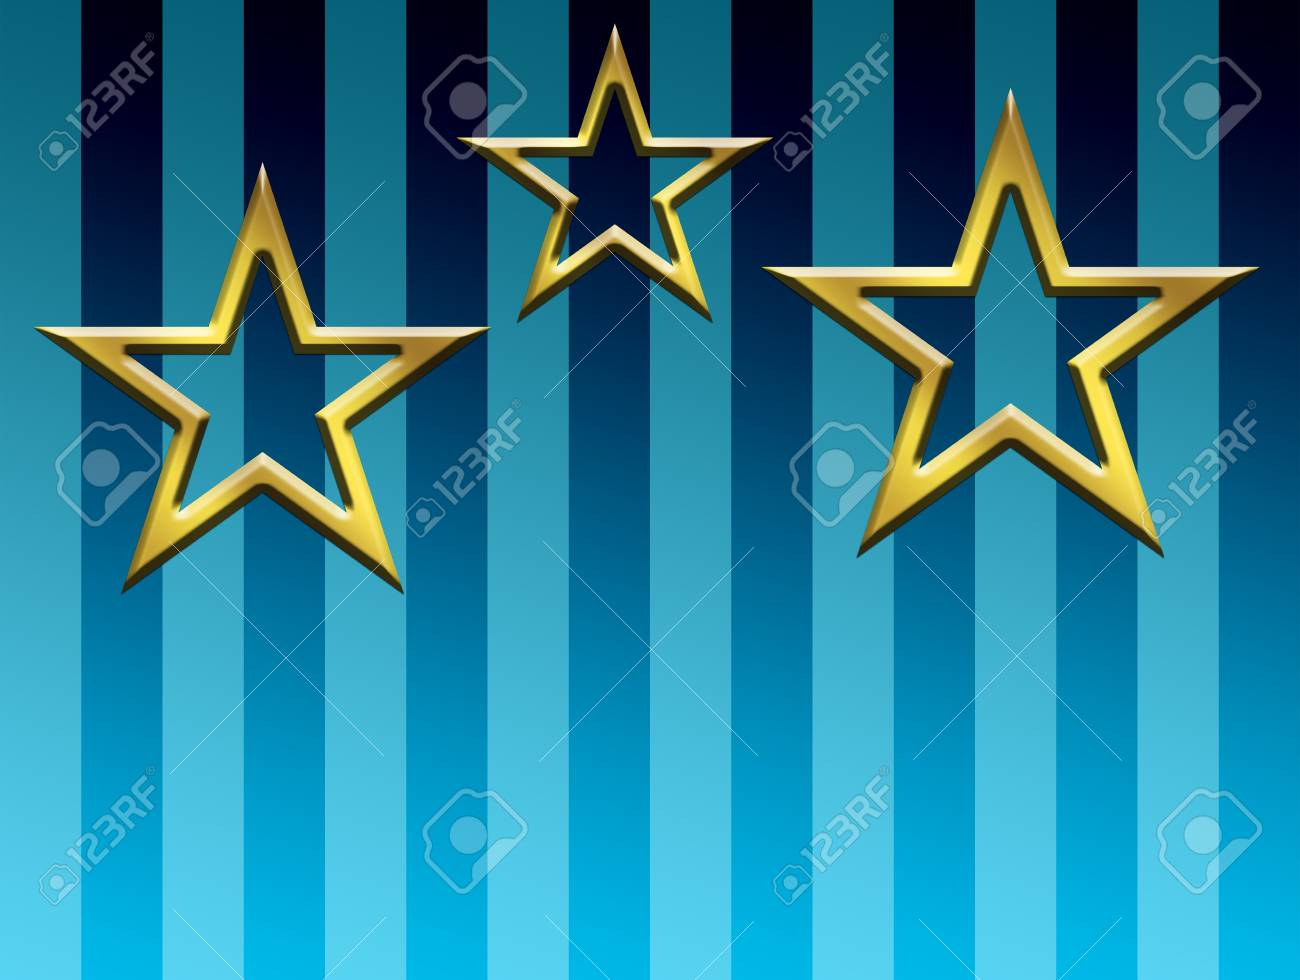 Gold stars over blue lines background. Illustration Stock Photo - 9692979